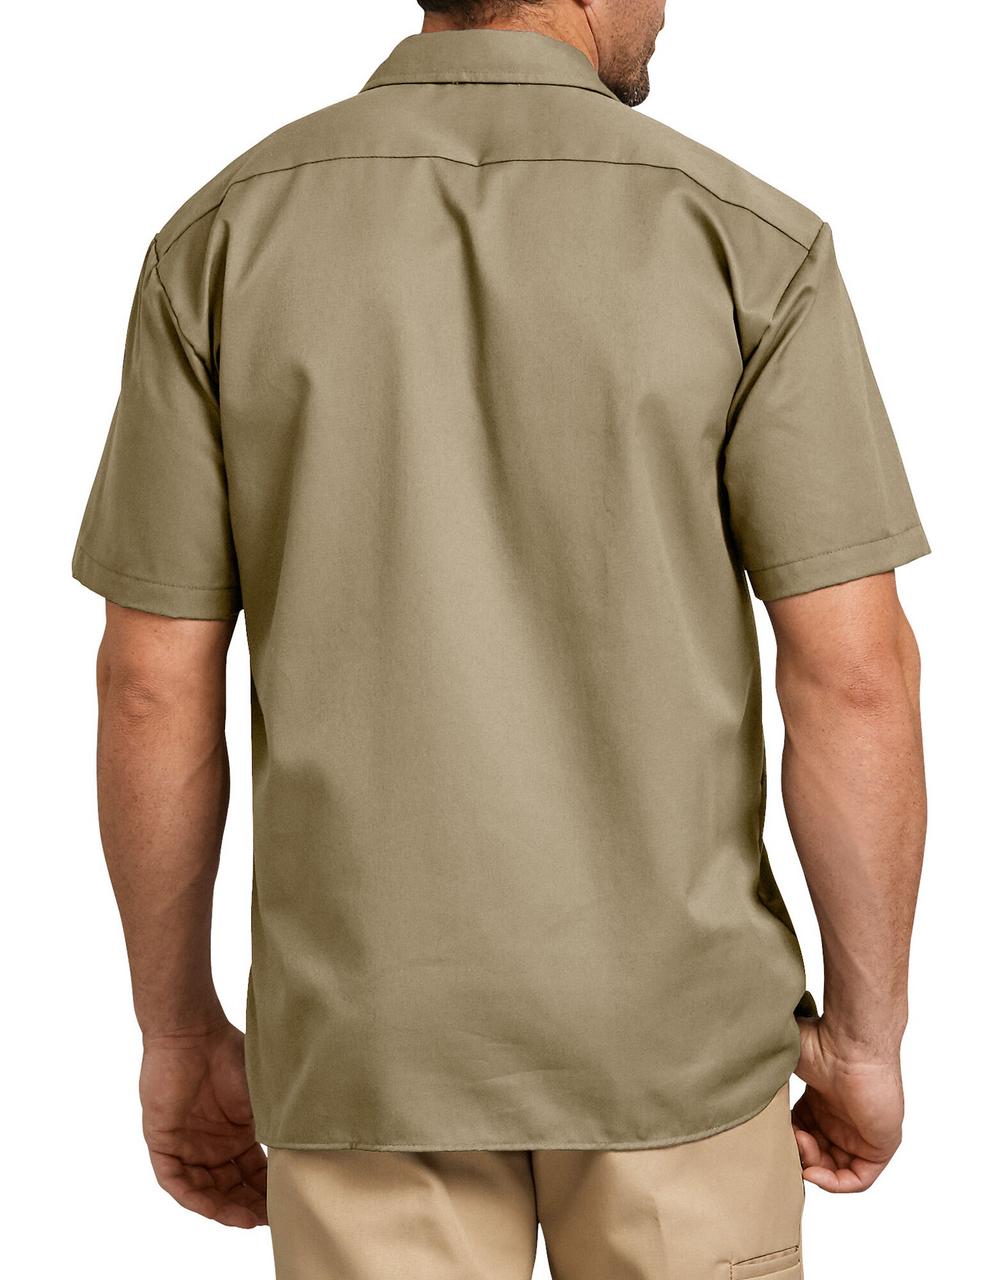 Dickies Short Sleeve Work Shirt, Military Khaki